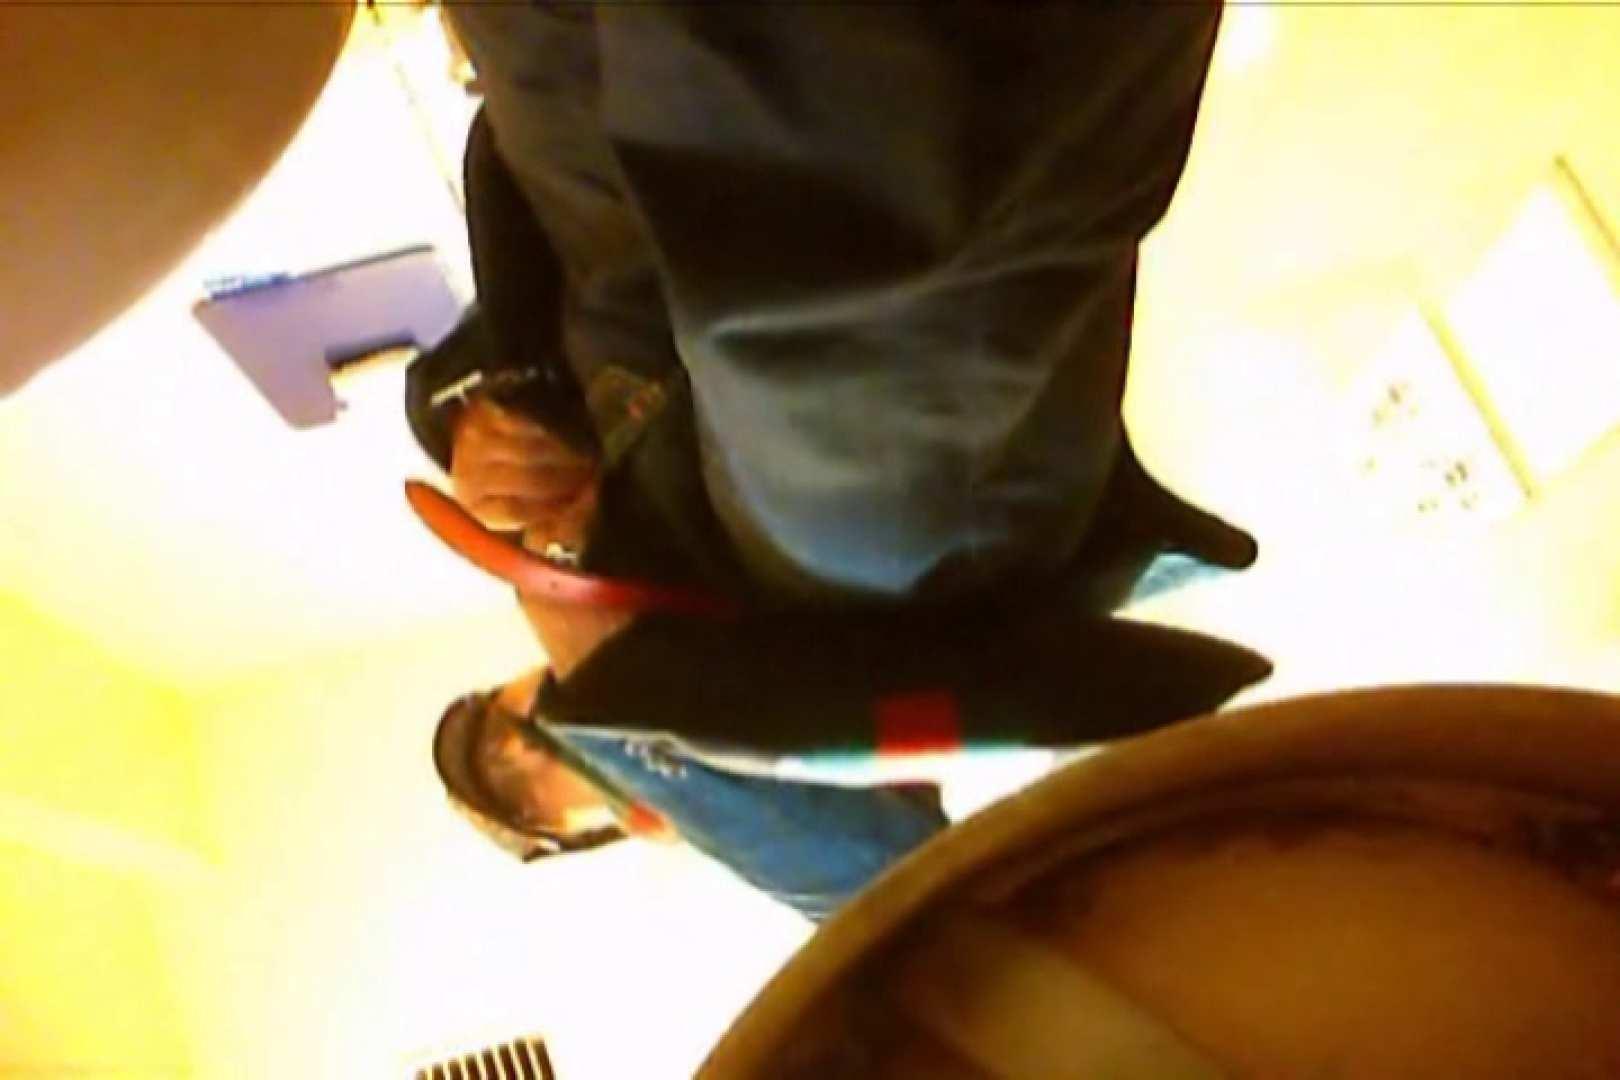 SEASON 2ND!掴み取りさんの洗面所覗き!in新幹線!VOL.13 リーマン系ボーイズ | 人気シリーズ  80pic 25